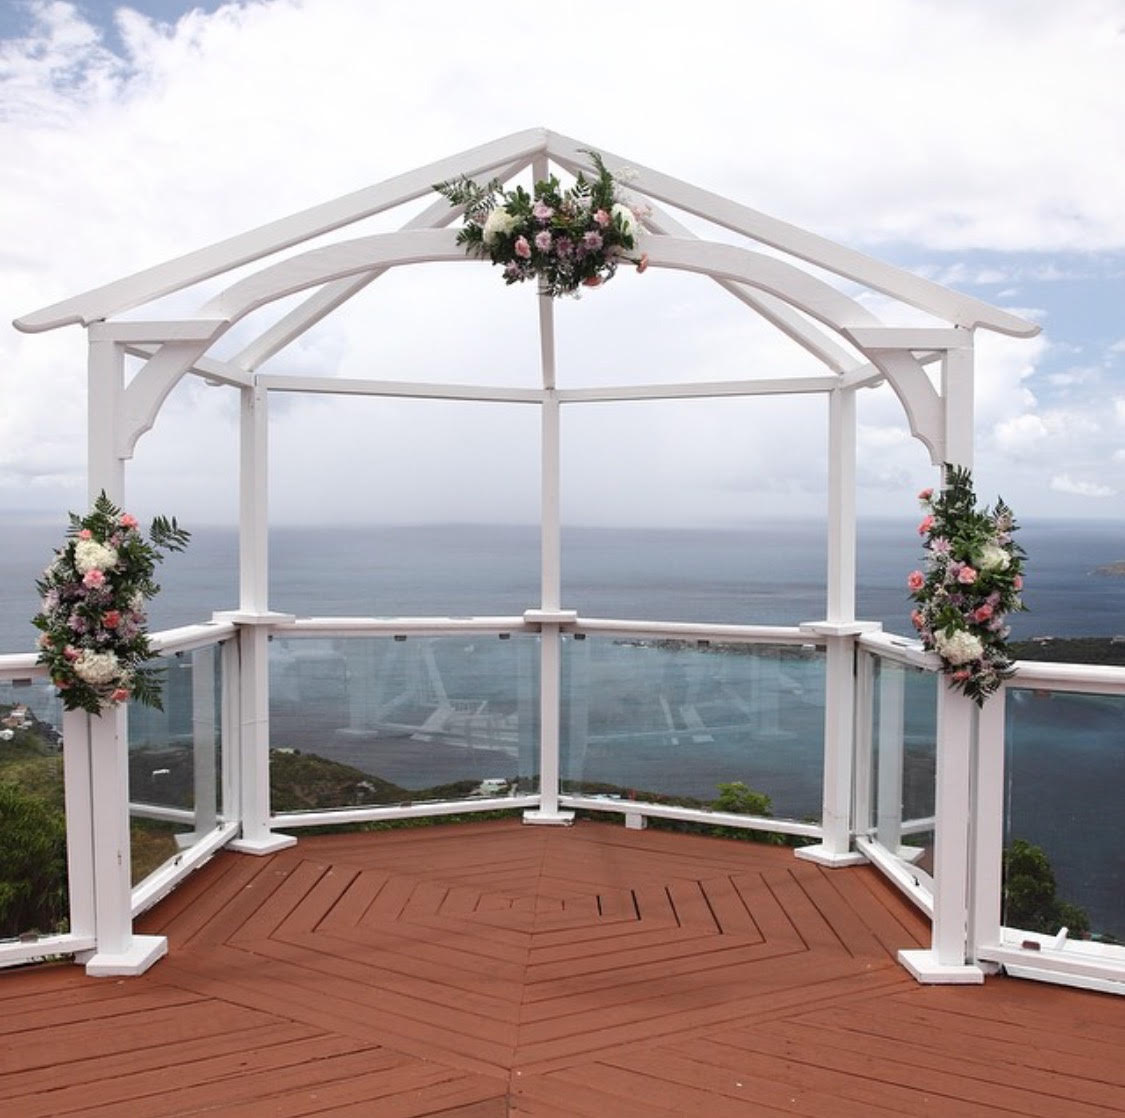 Wedding Arches & Aisles - St. Thomas Weddings - Flawless Weddings ...